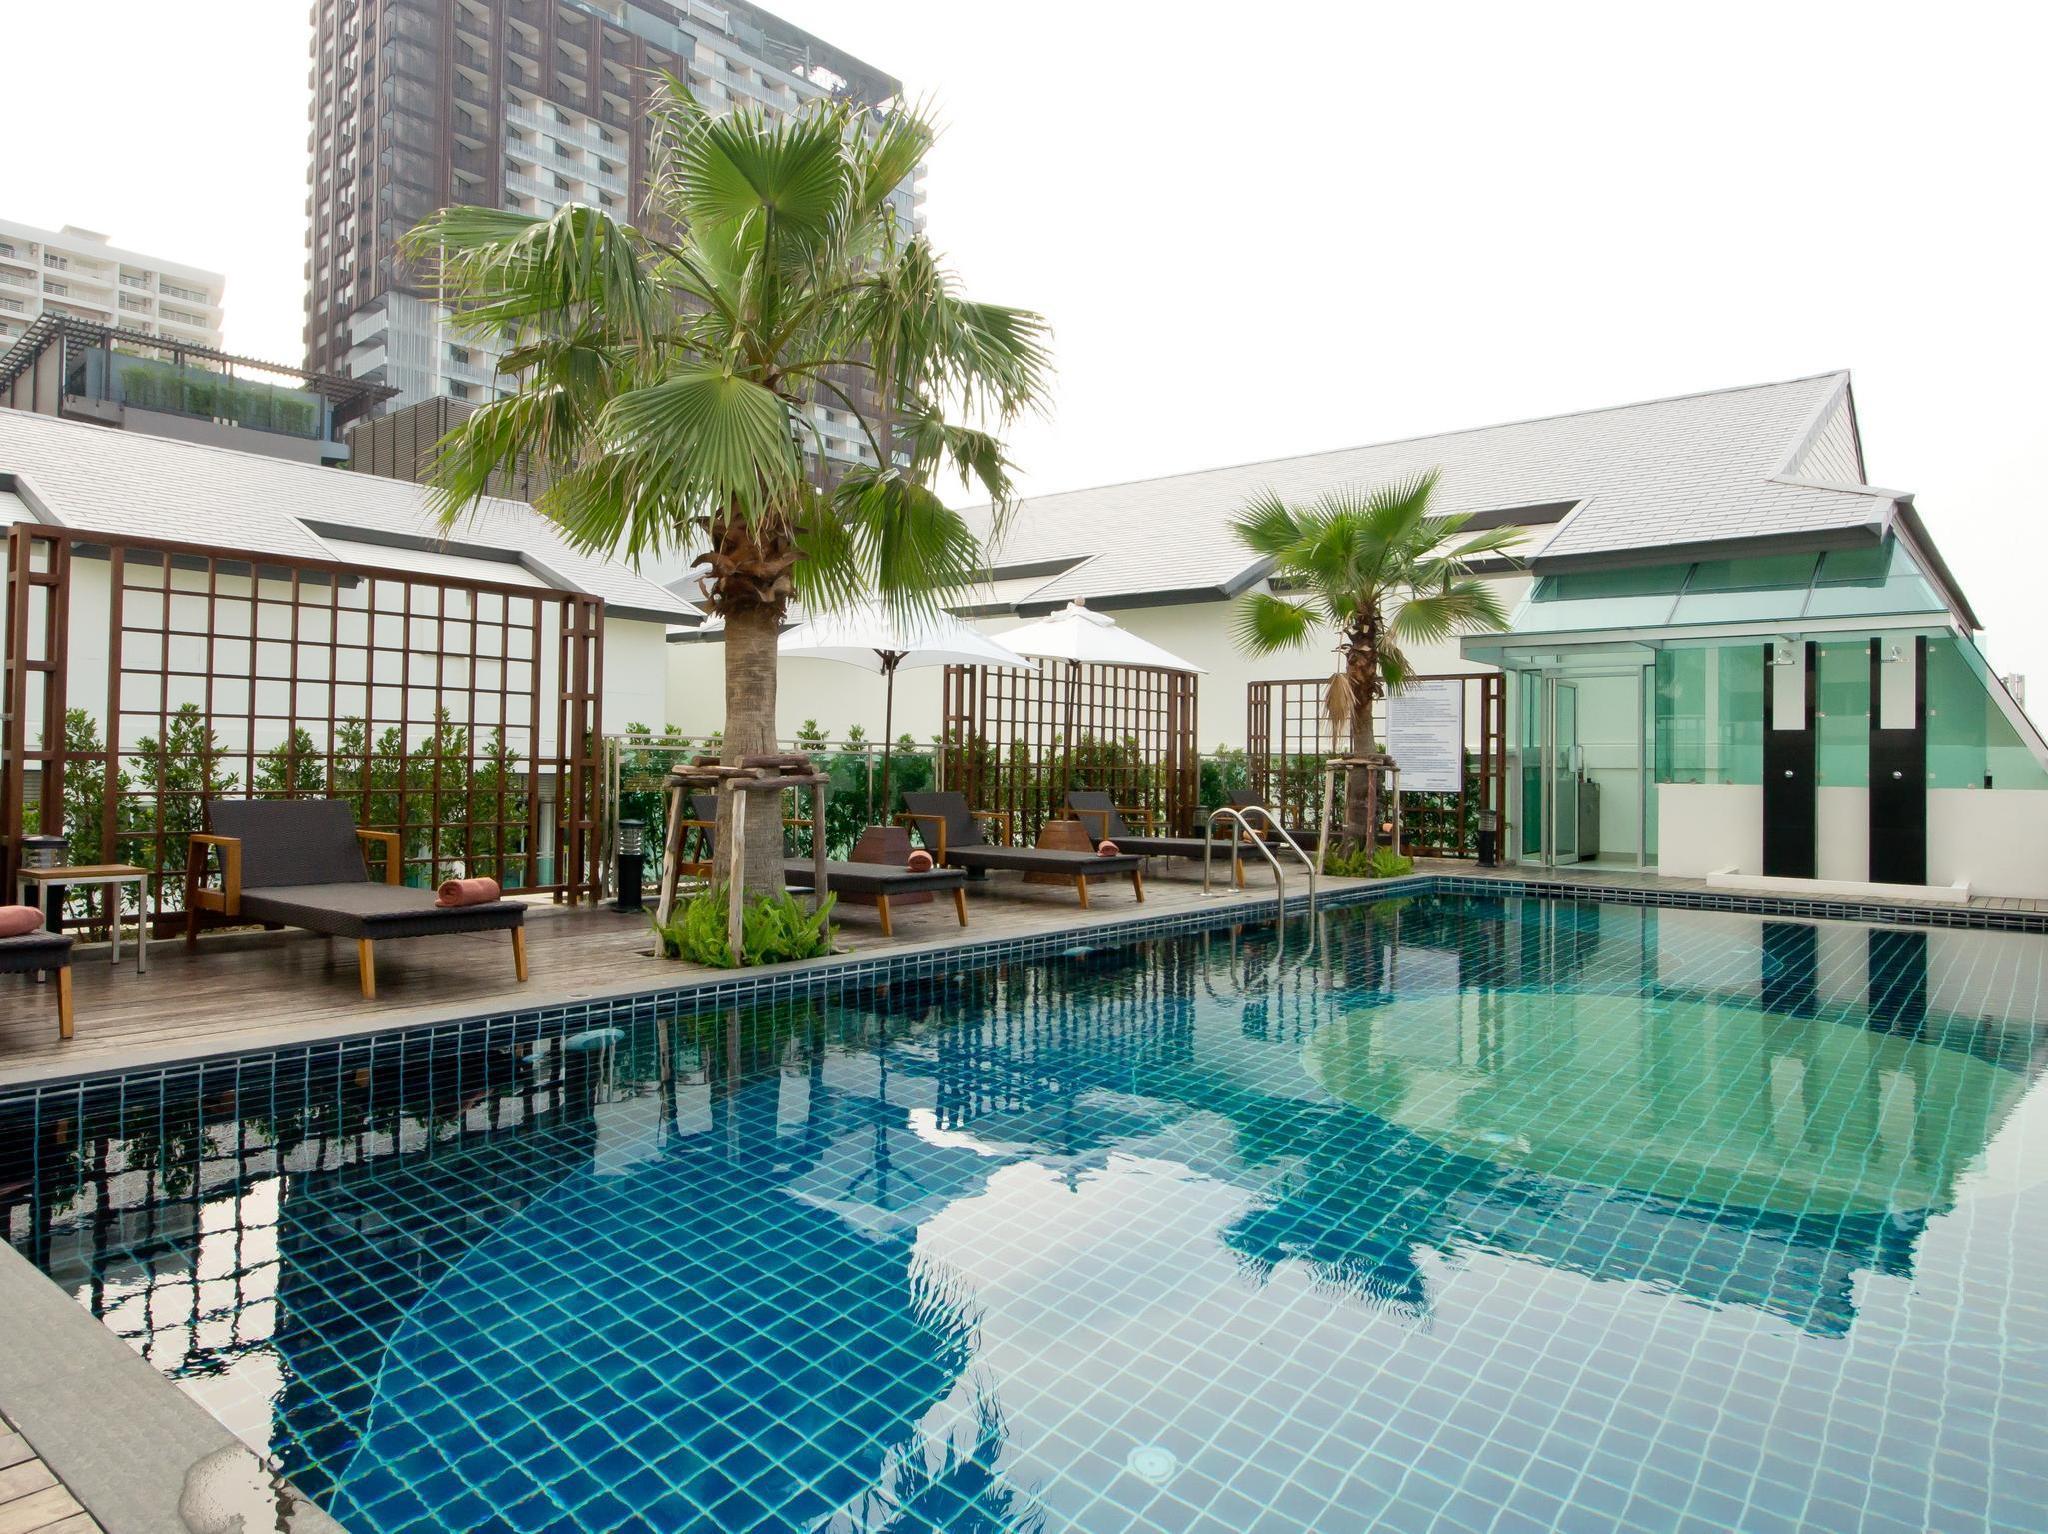 Sunshine Hotel & Residences ซันไชน์ โฮเต็ล แอนด์ เรสซิเดนซ์